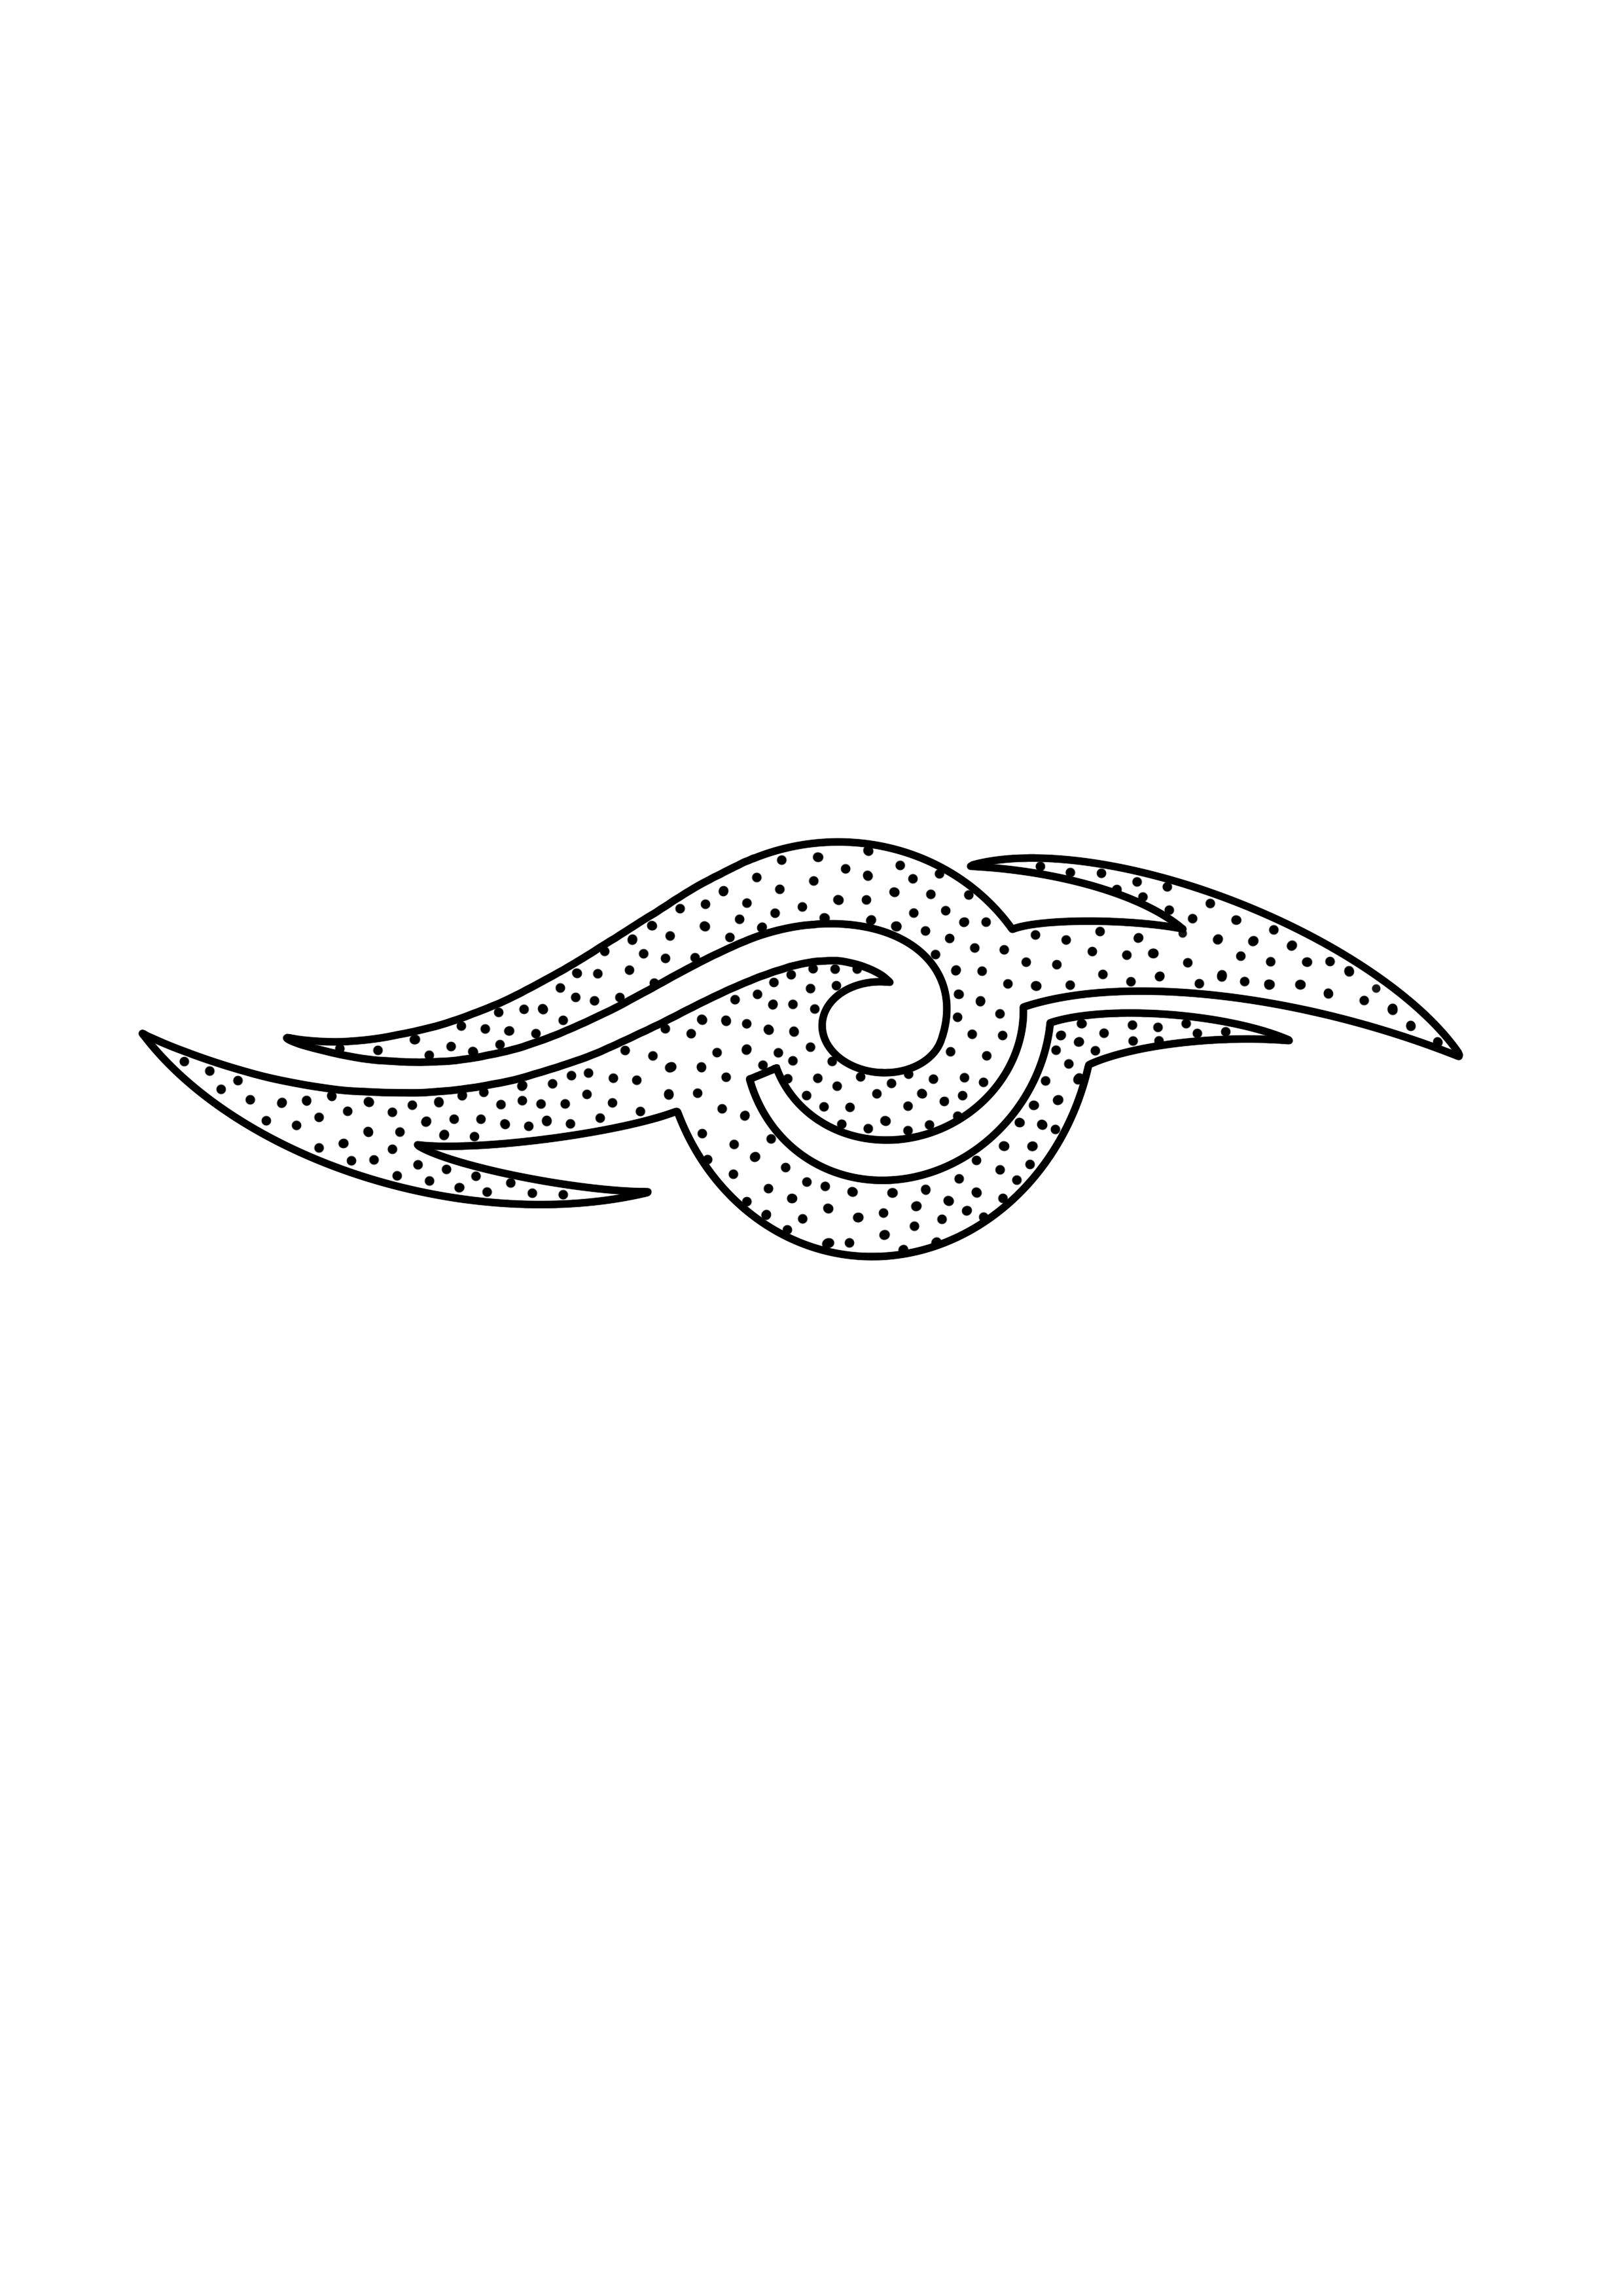 tatuaże kraków